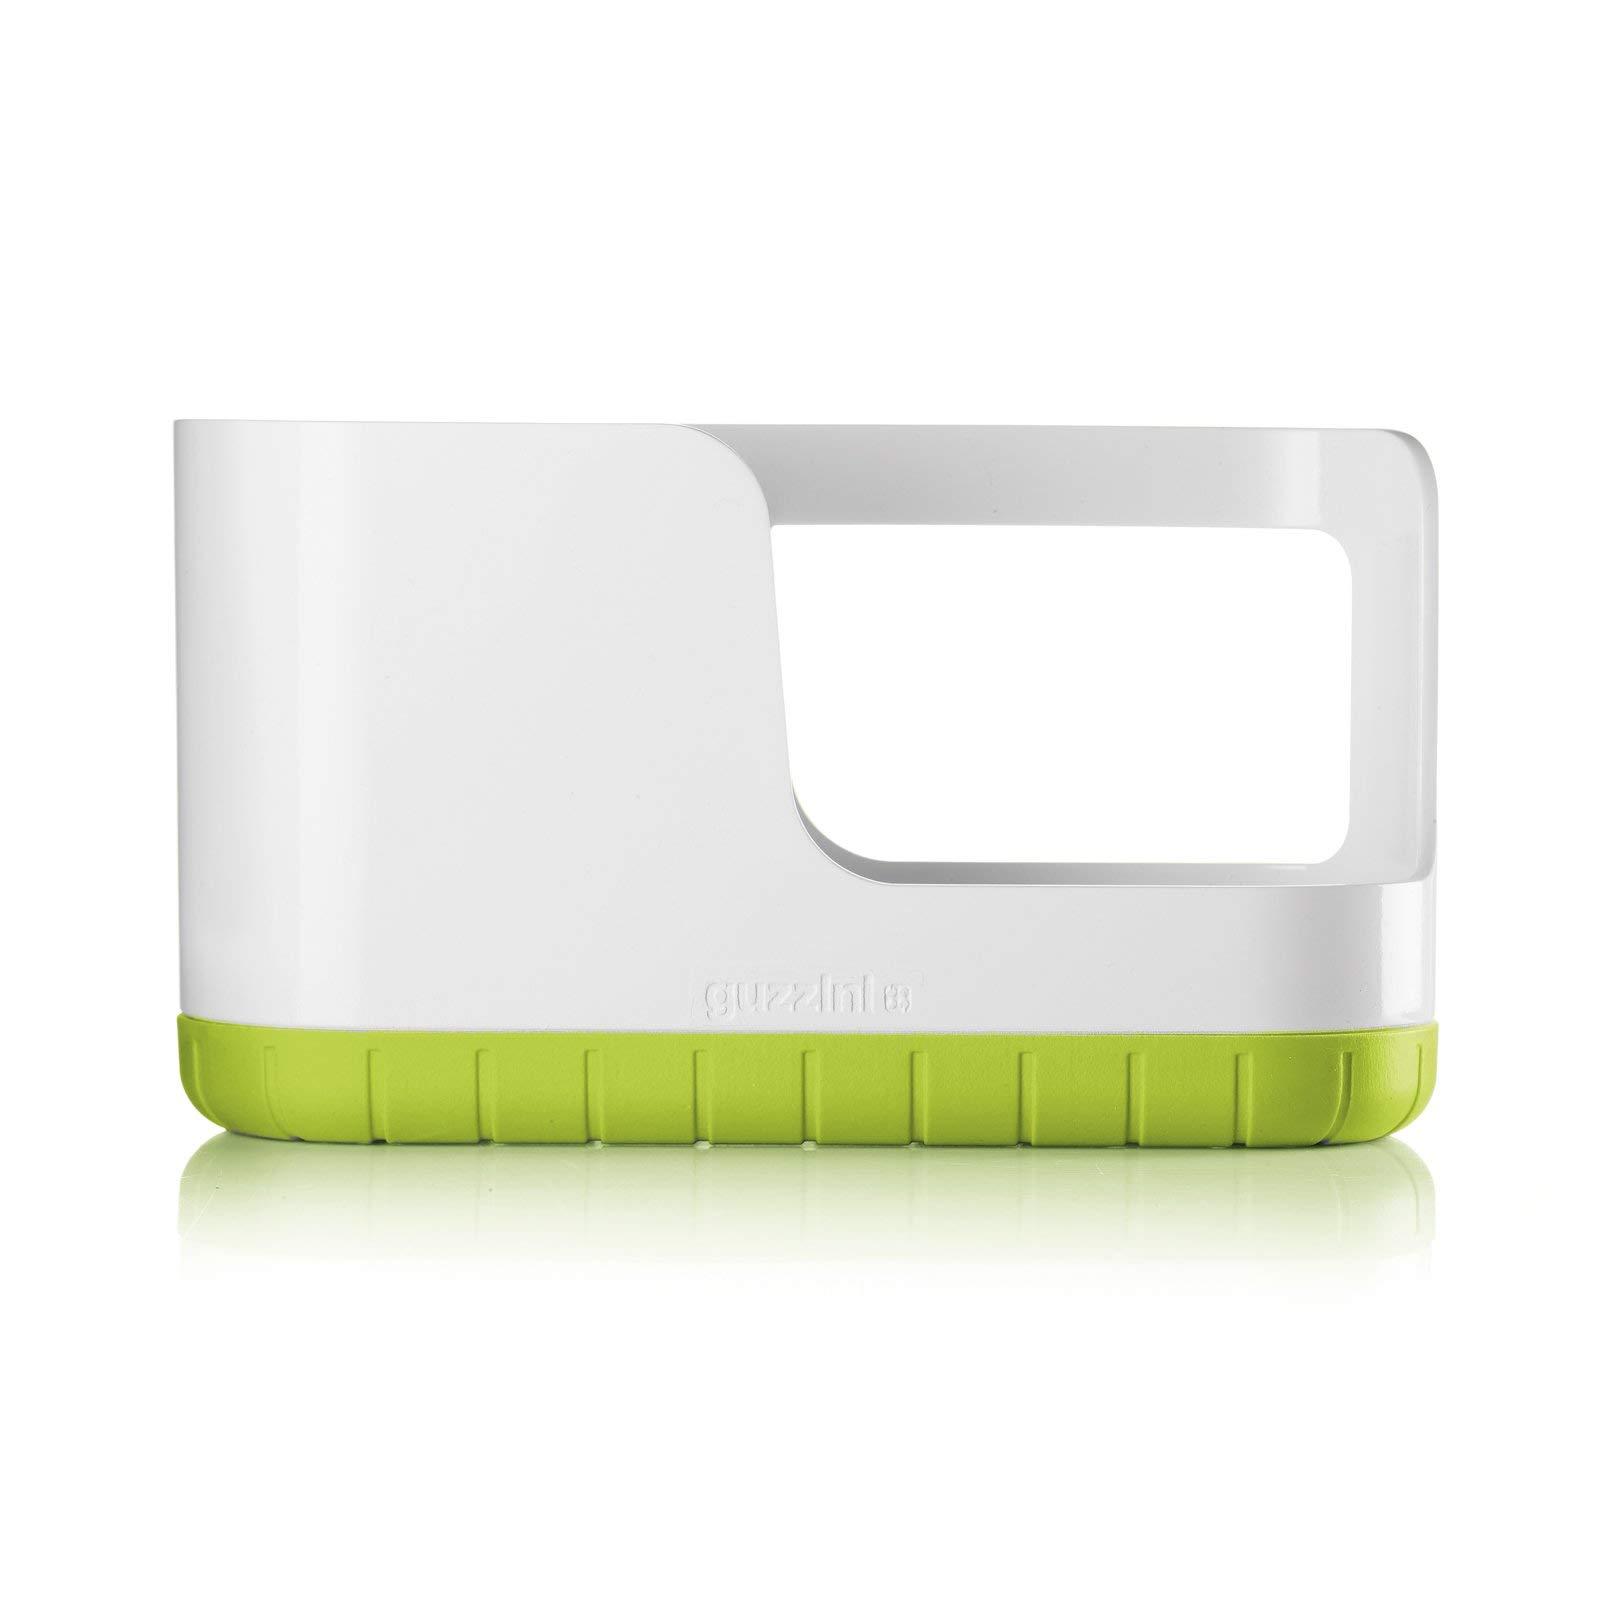 Guzzini My Kitchen Sink Tidy Caddy, 5-1/3-Inches, Apple Green